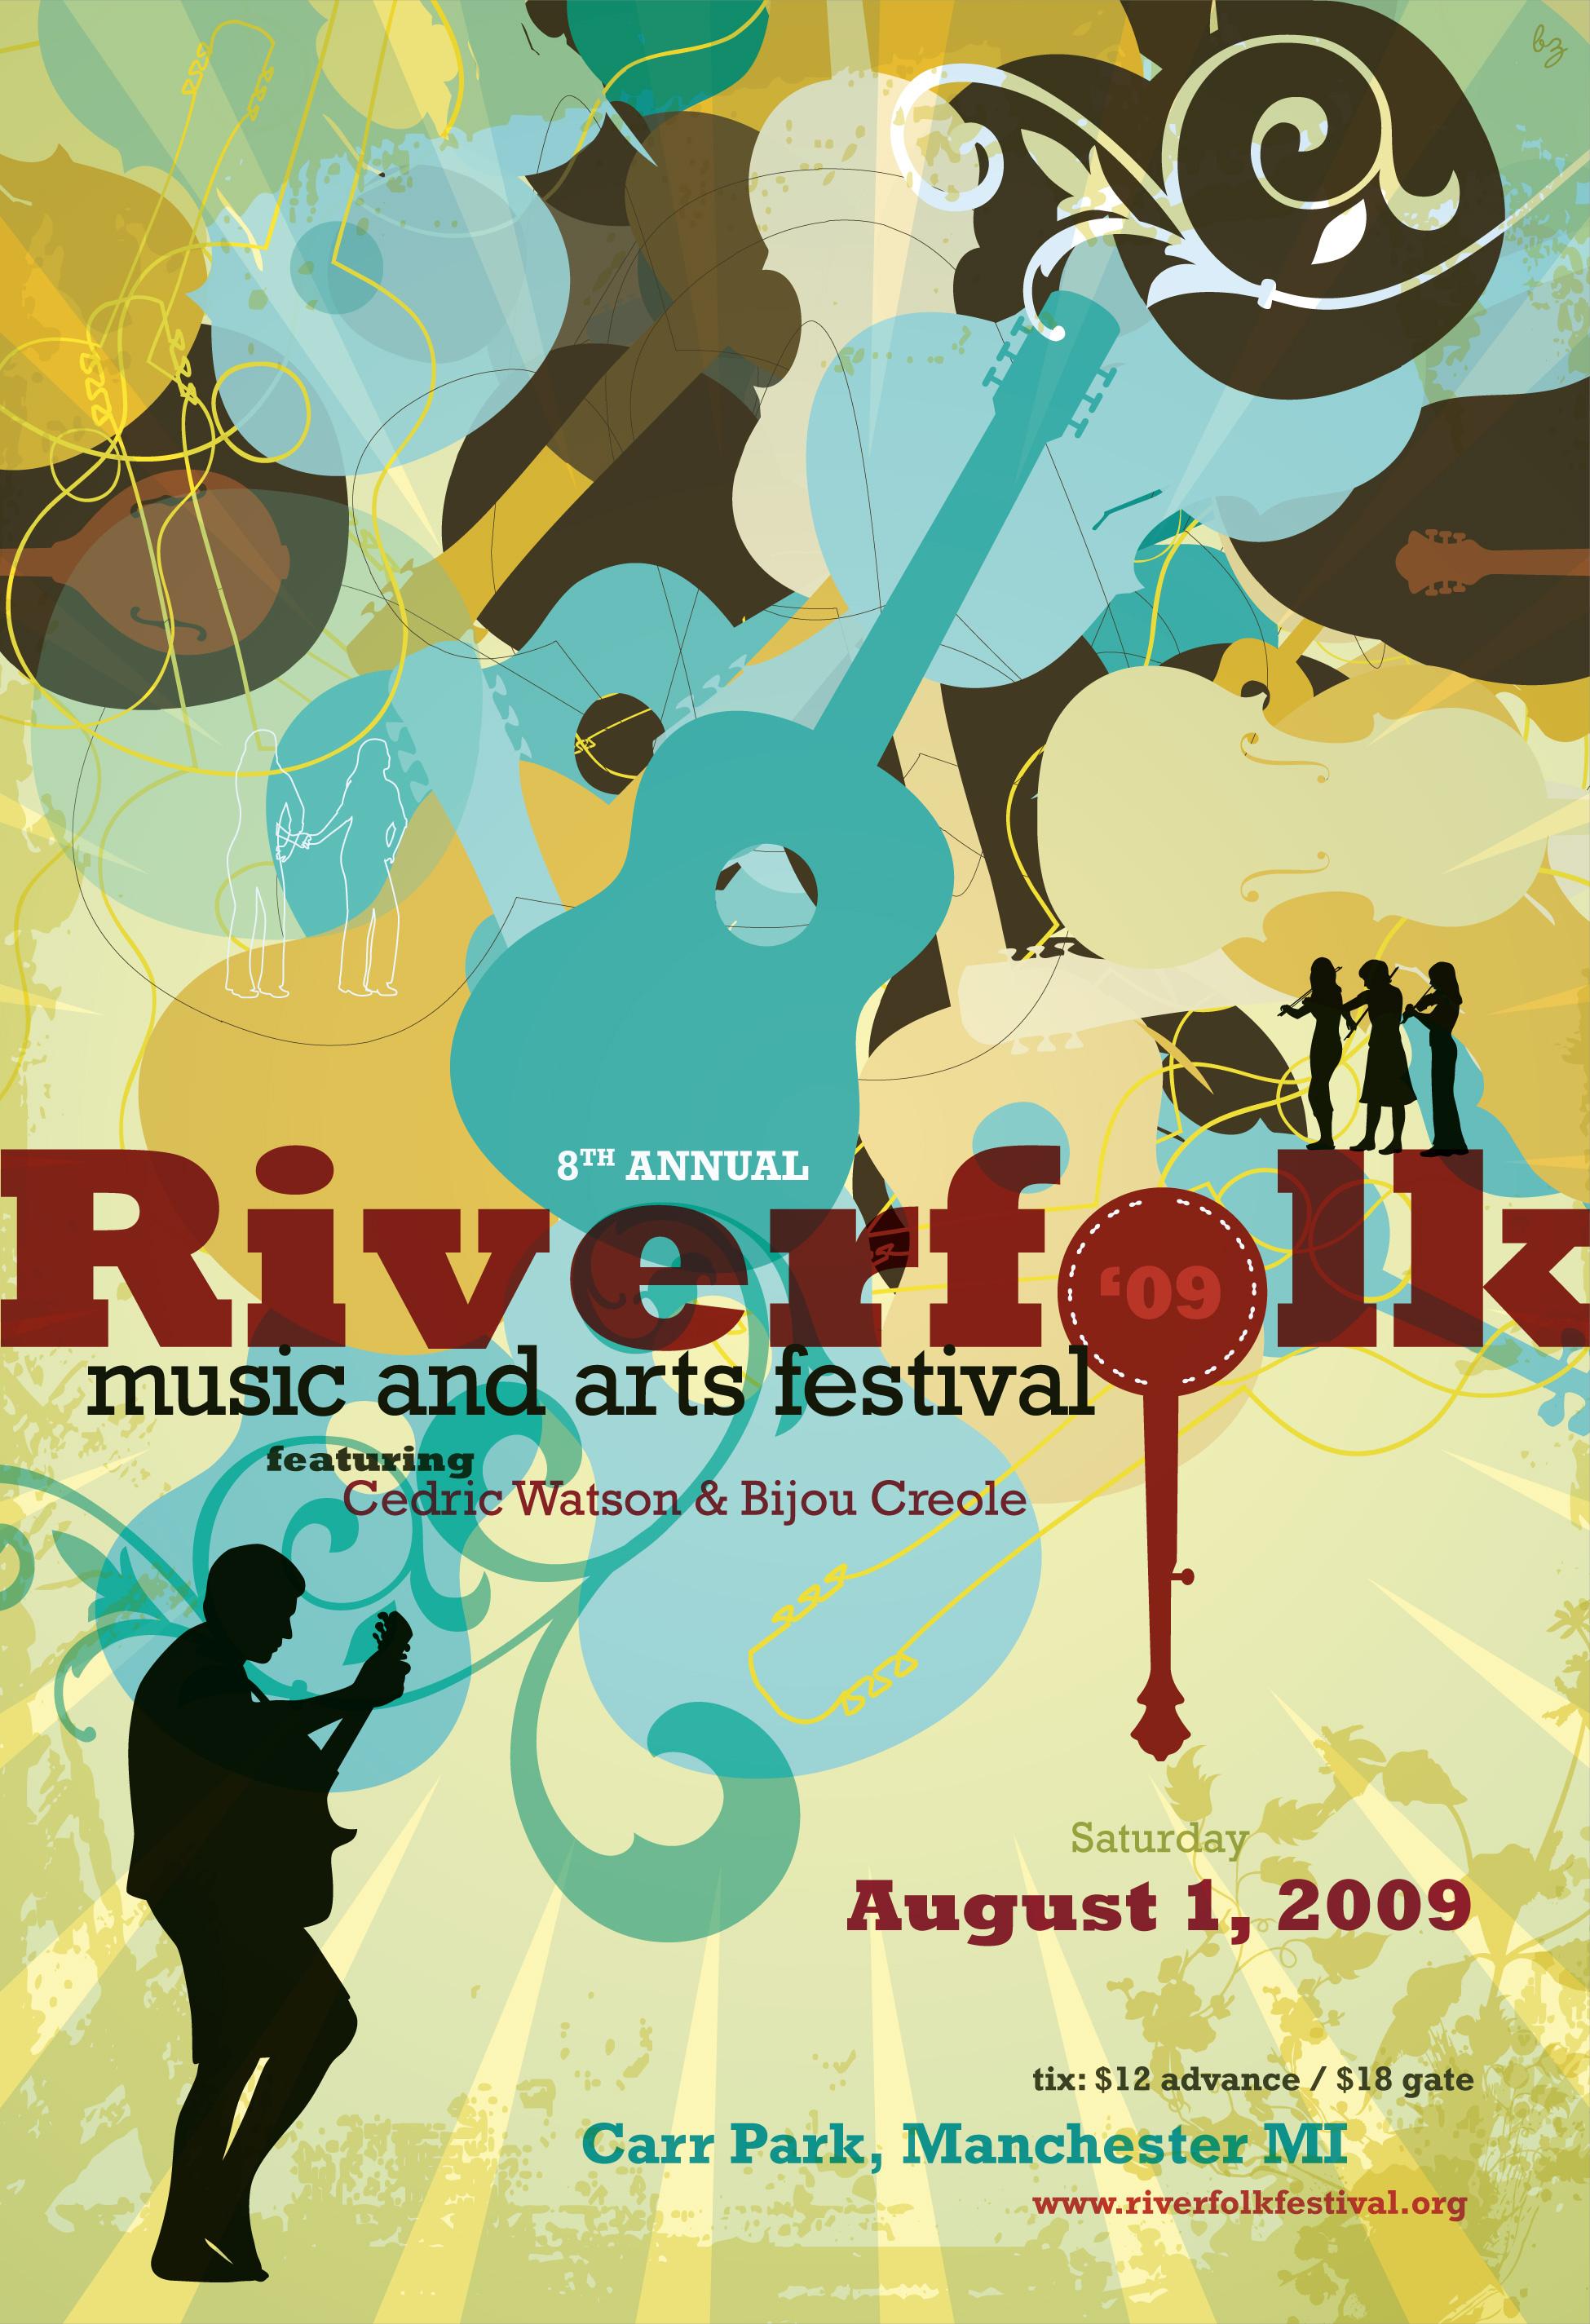 Copy of Riverfolk Festival Poster Design